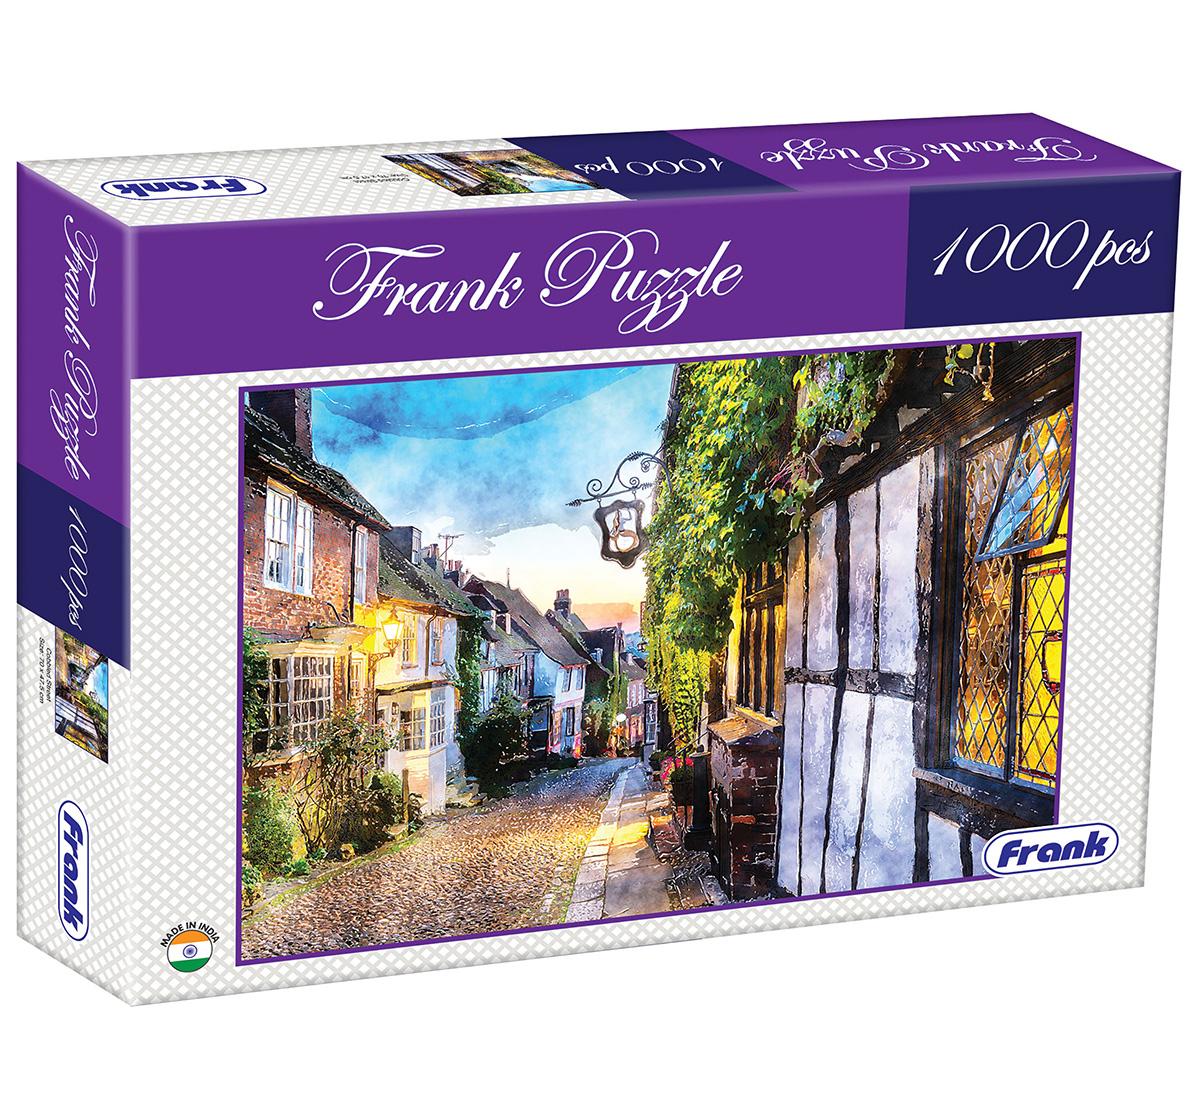 Frank | Frank Cobbled Street Puzzle 1000 Pieces, 14Y+